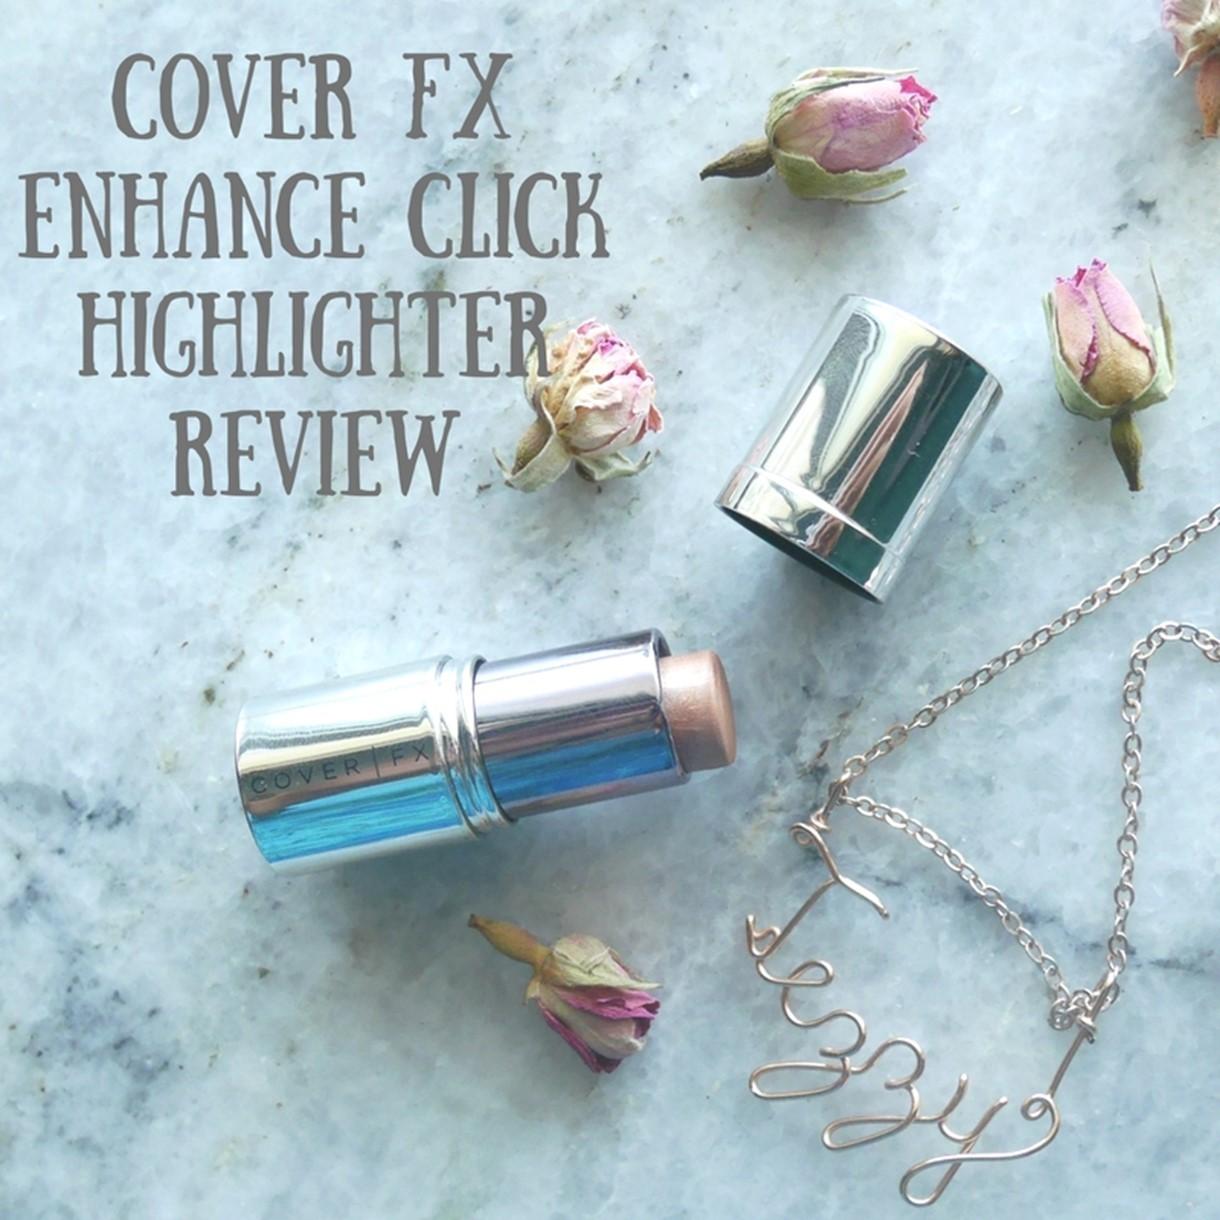 Cover FX Enhance Click Cream Enhancer Rose Gold Highlighter Review Dubai Beauty Blog Sephora Middle East Highlighter Strobing